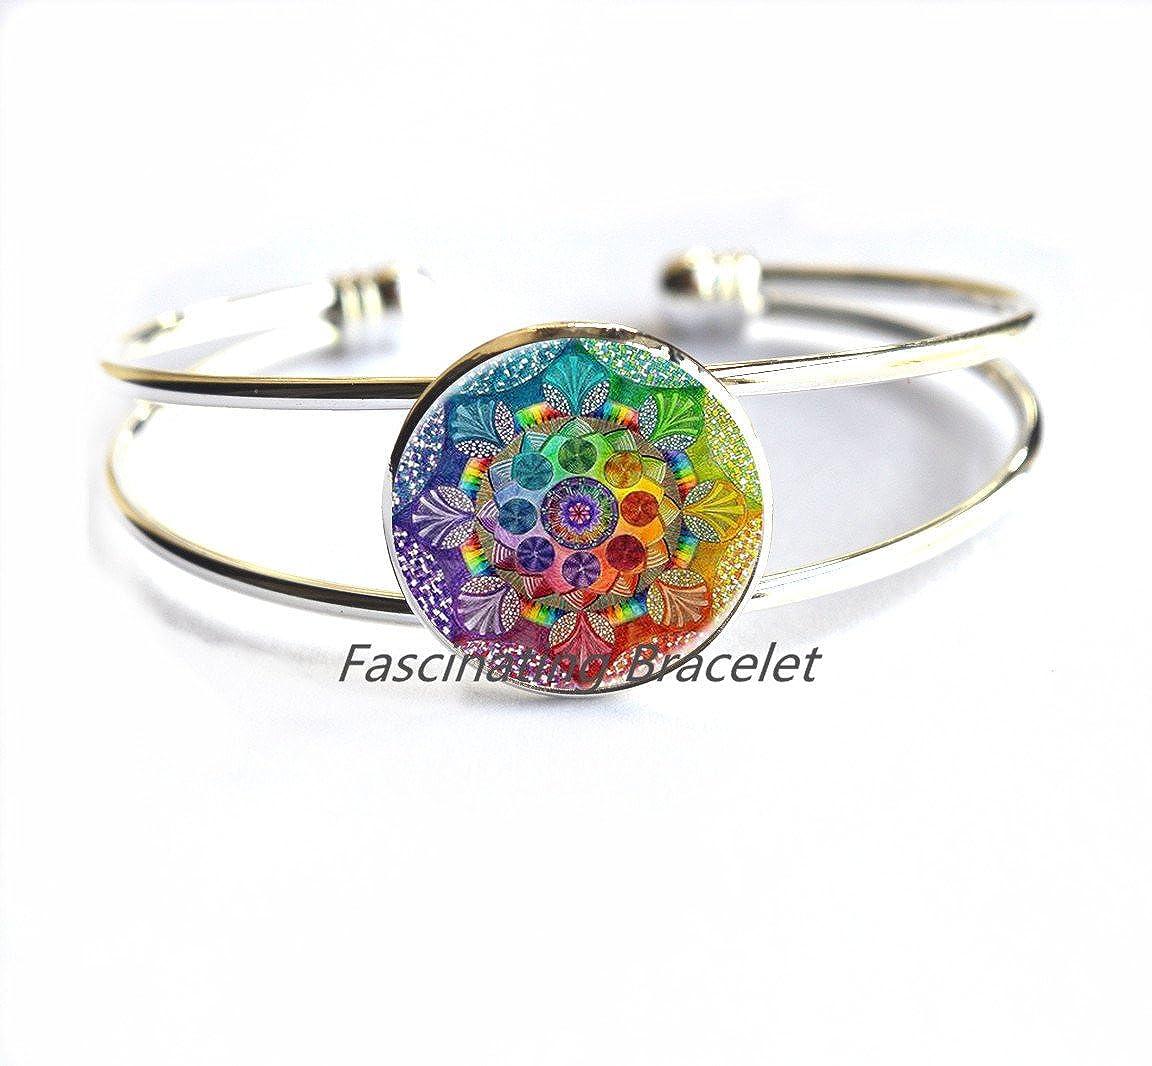 /Fashion Bracelet,Handmade henna yaga Bracelet om symbol buddhism Mandala Bracelet Bracelets Art Jewelry Glass Photo Bracelet,AE0046